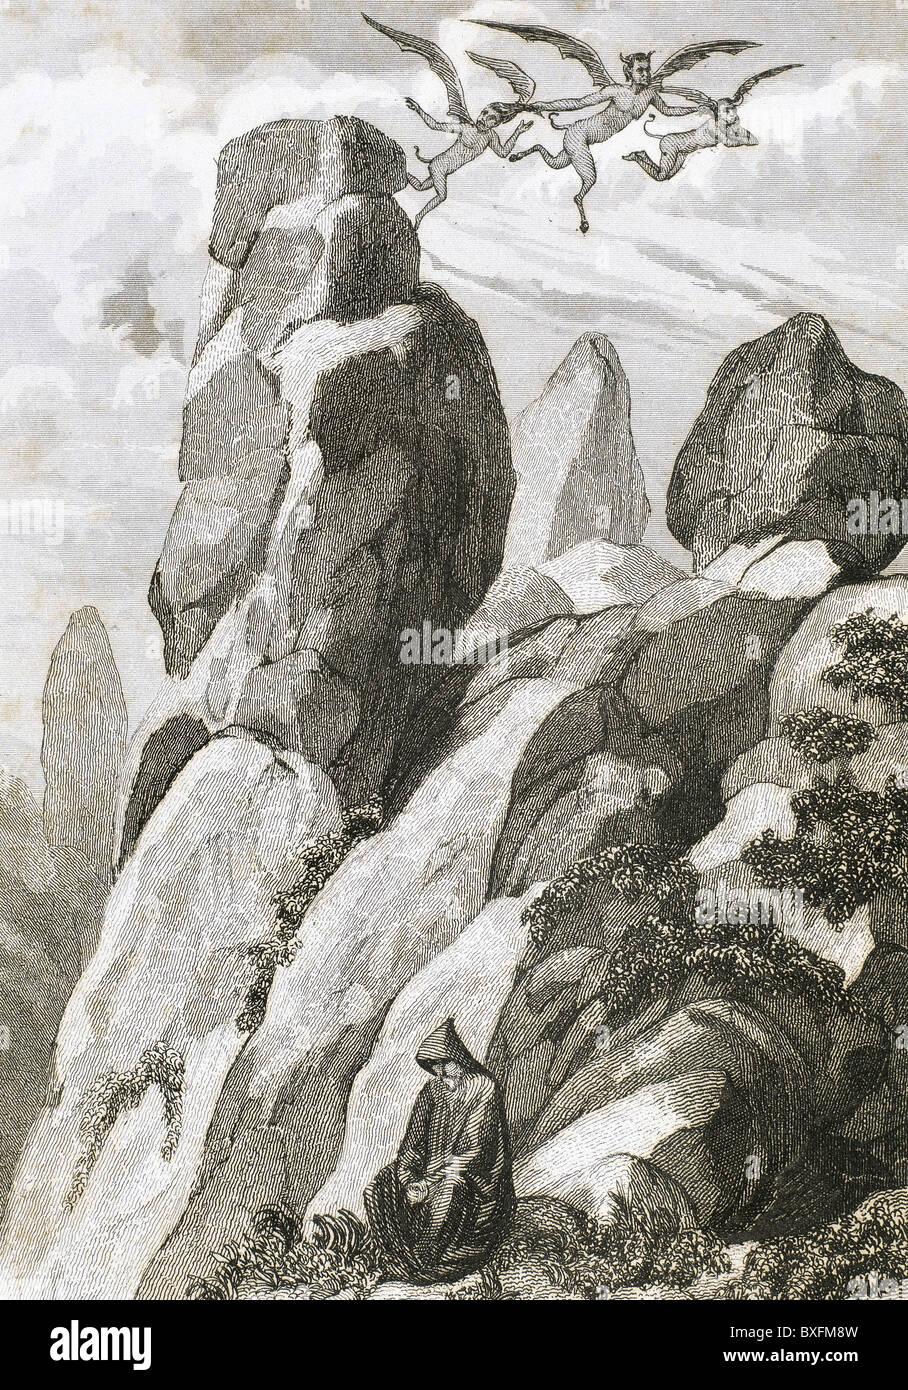 Legend of Fray Juan Garin, hermit of Montserrat. Fray Garin meditating on the mountain of Montserrat. - Stock Image